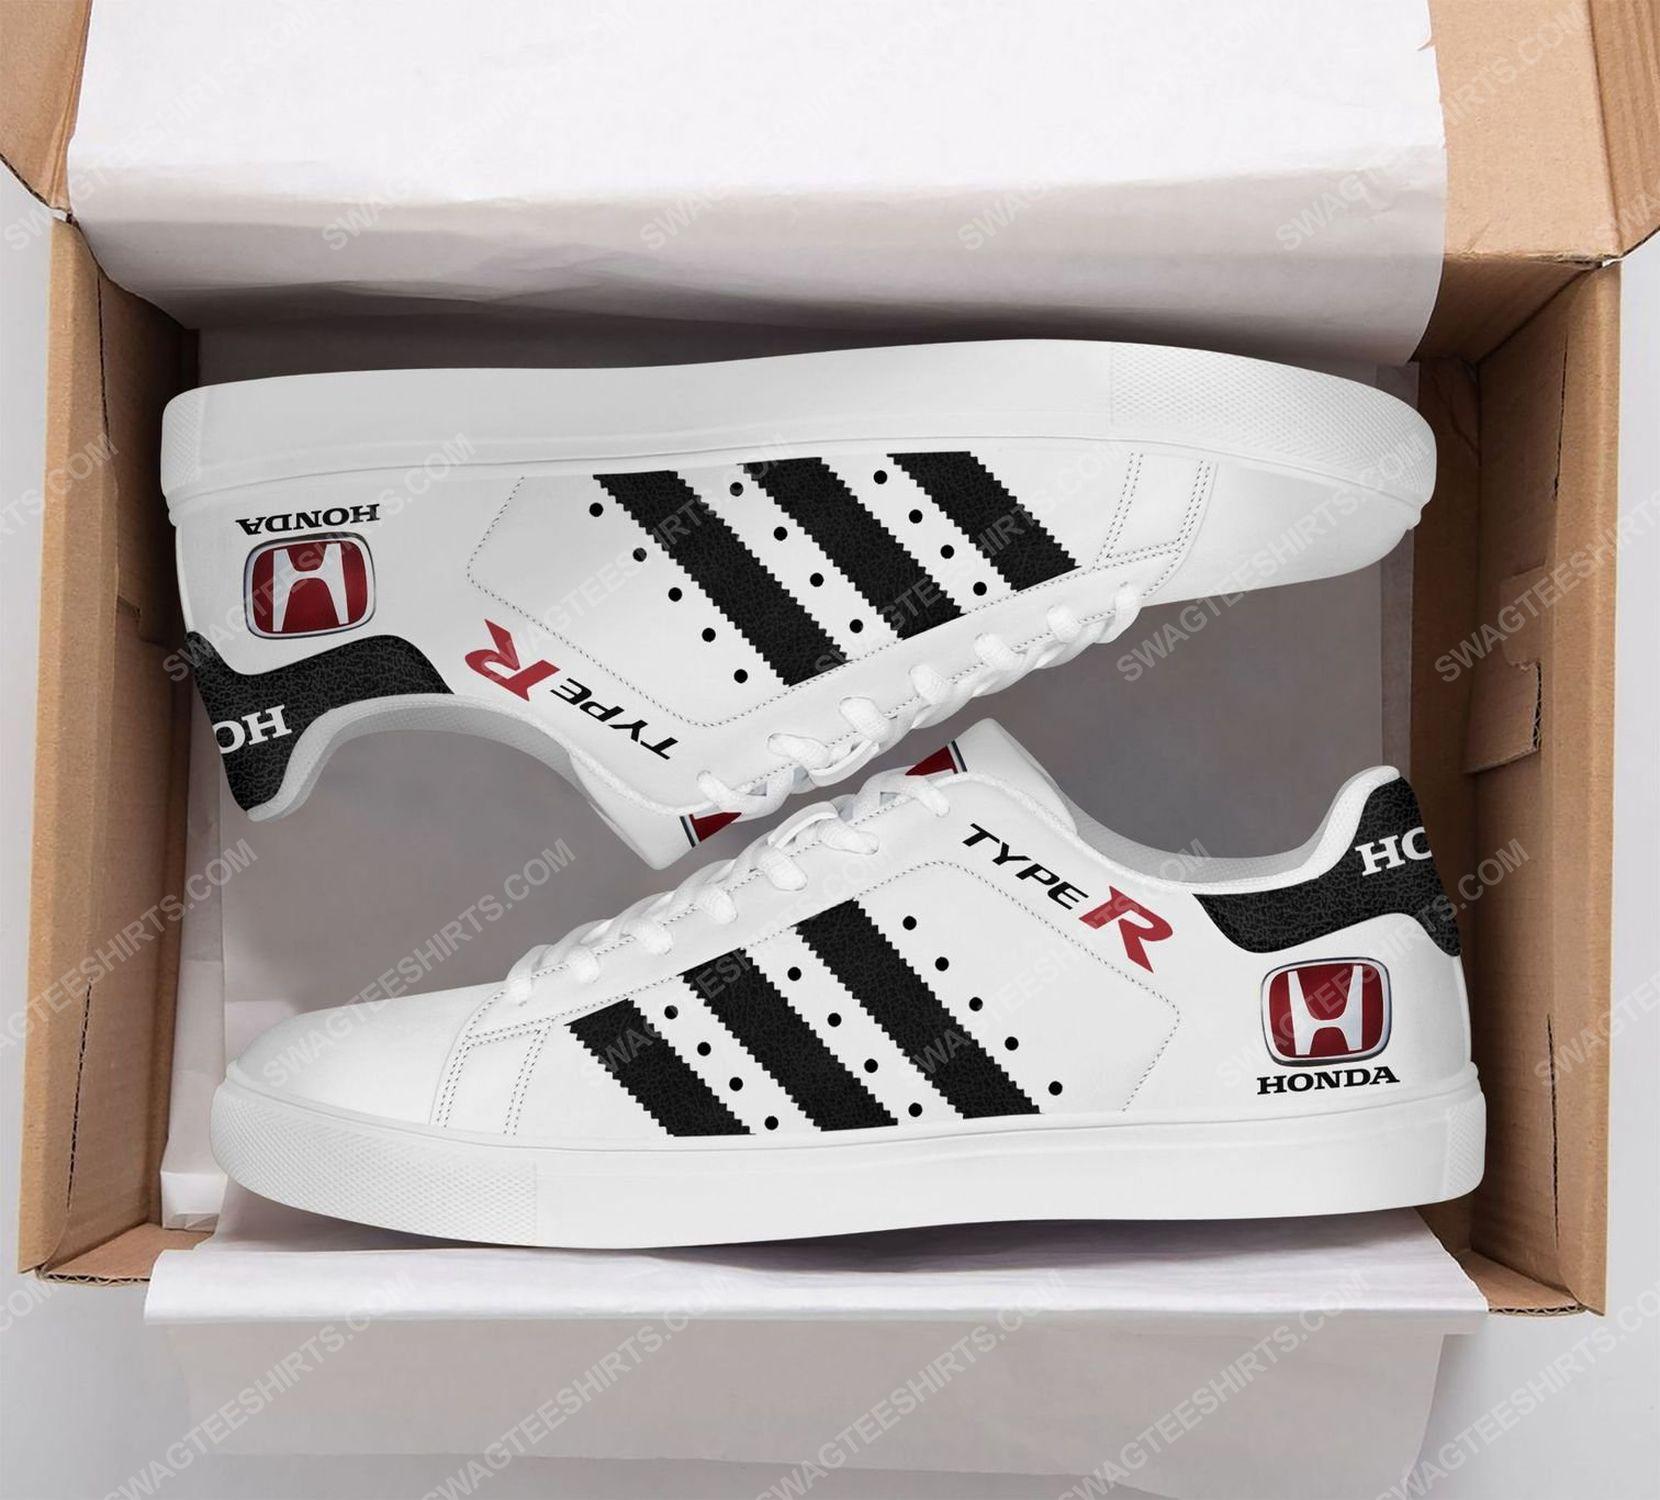 Honda civic type r version white stan smith shoes 2